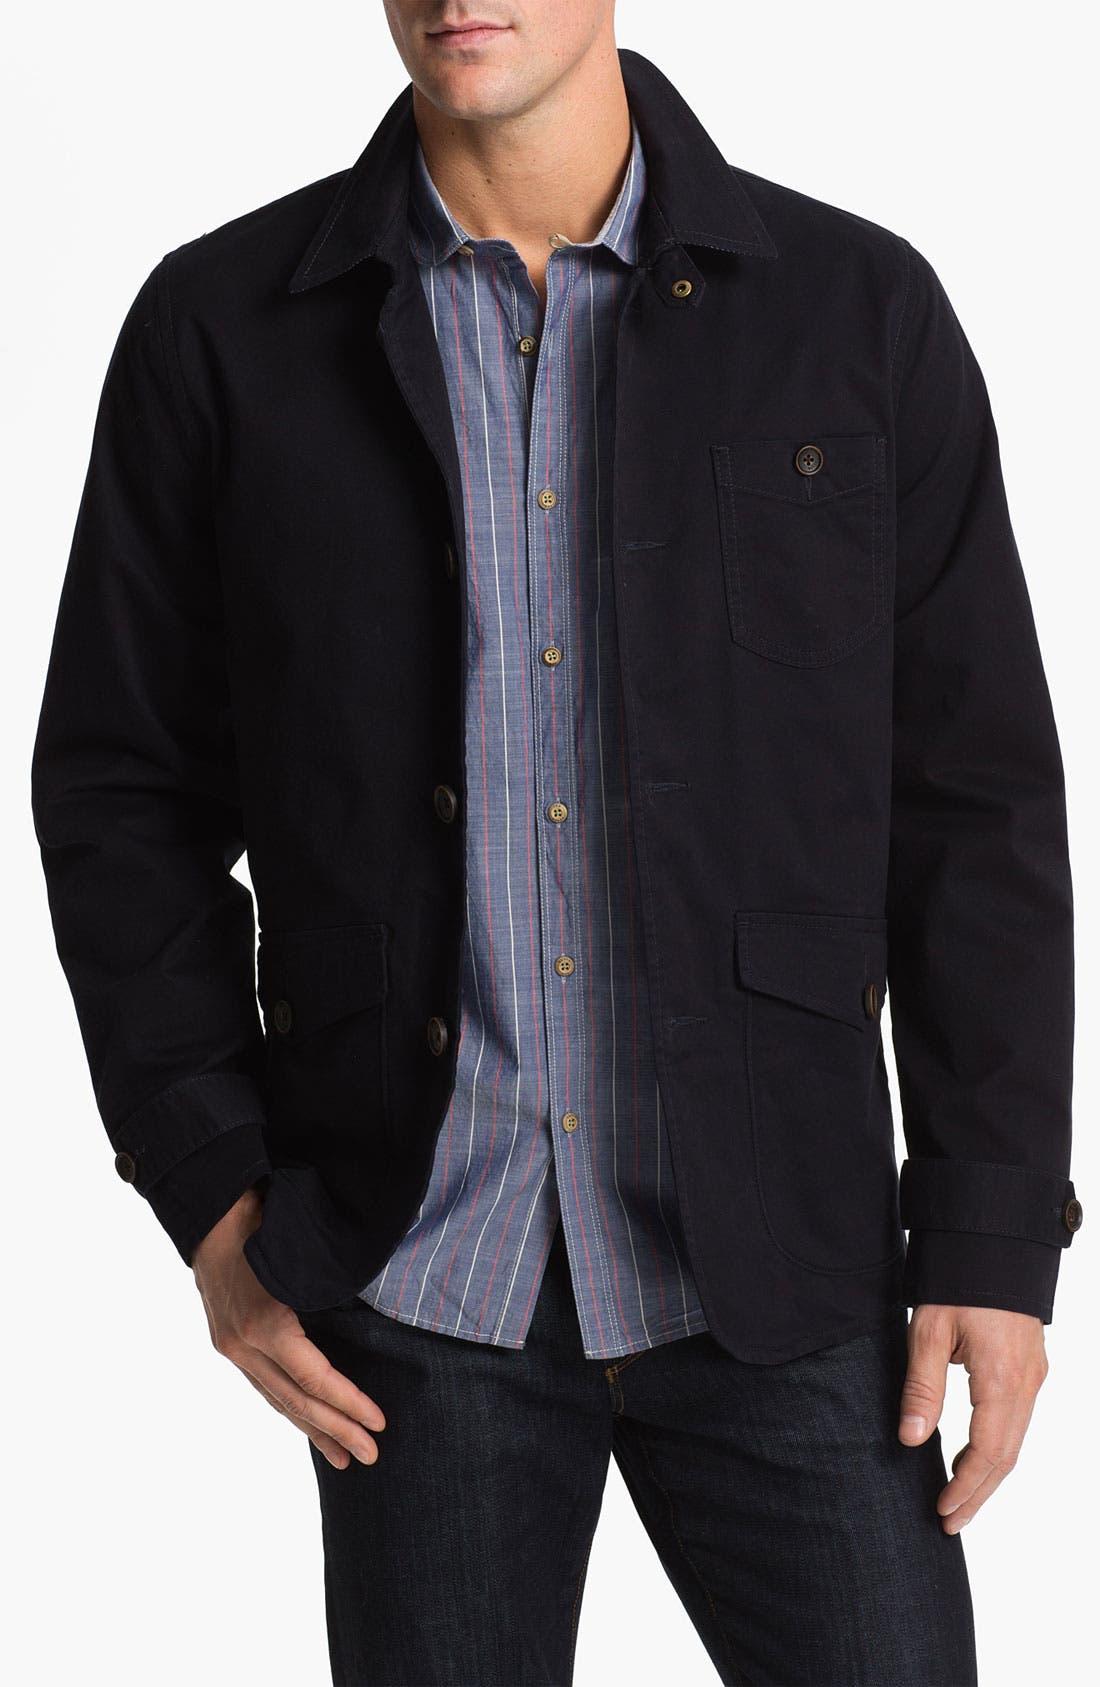 Main Image - Ted Baker London 'McLagen' Cotton Jacket